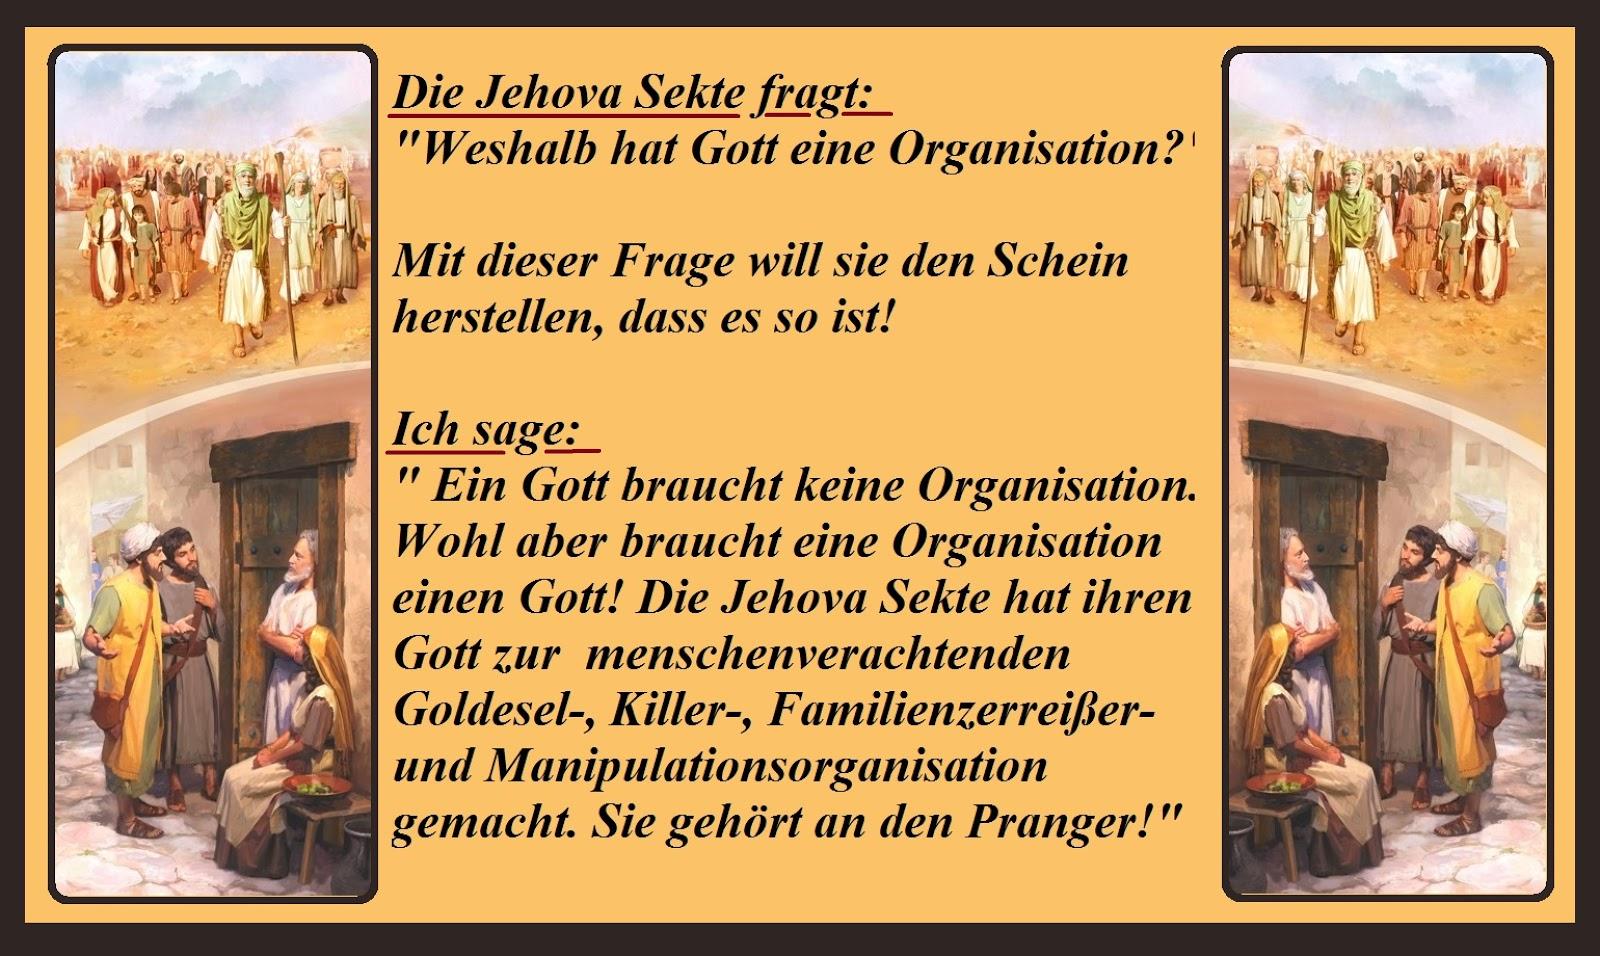 Partnervermittlung Zeugen Jehovas